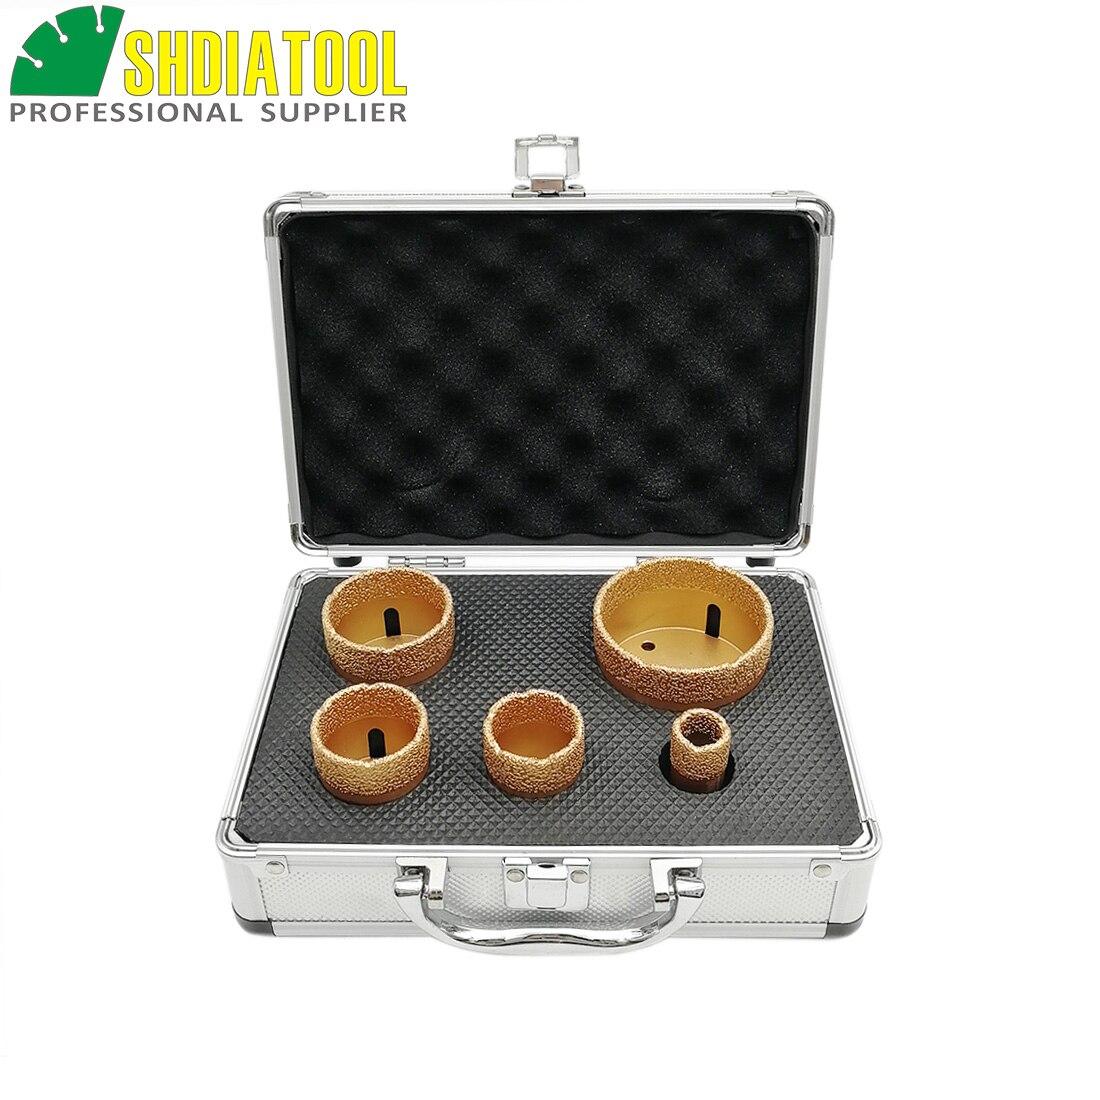 SHDIATOOL 1set M14 Vakuum Gelötete Diamant Bohren Bits Mit Box Dia 20 + 35 + 40 + 50 + 68mm Granit Marmor Keramik Loch Sah Core Bits